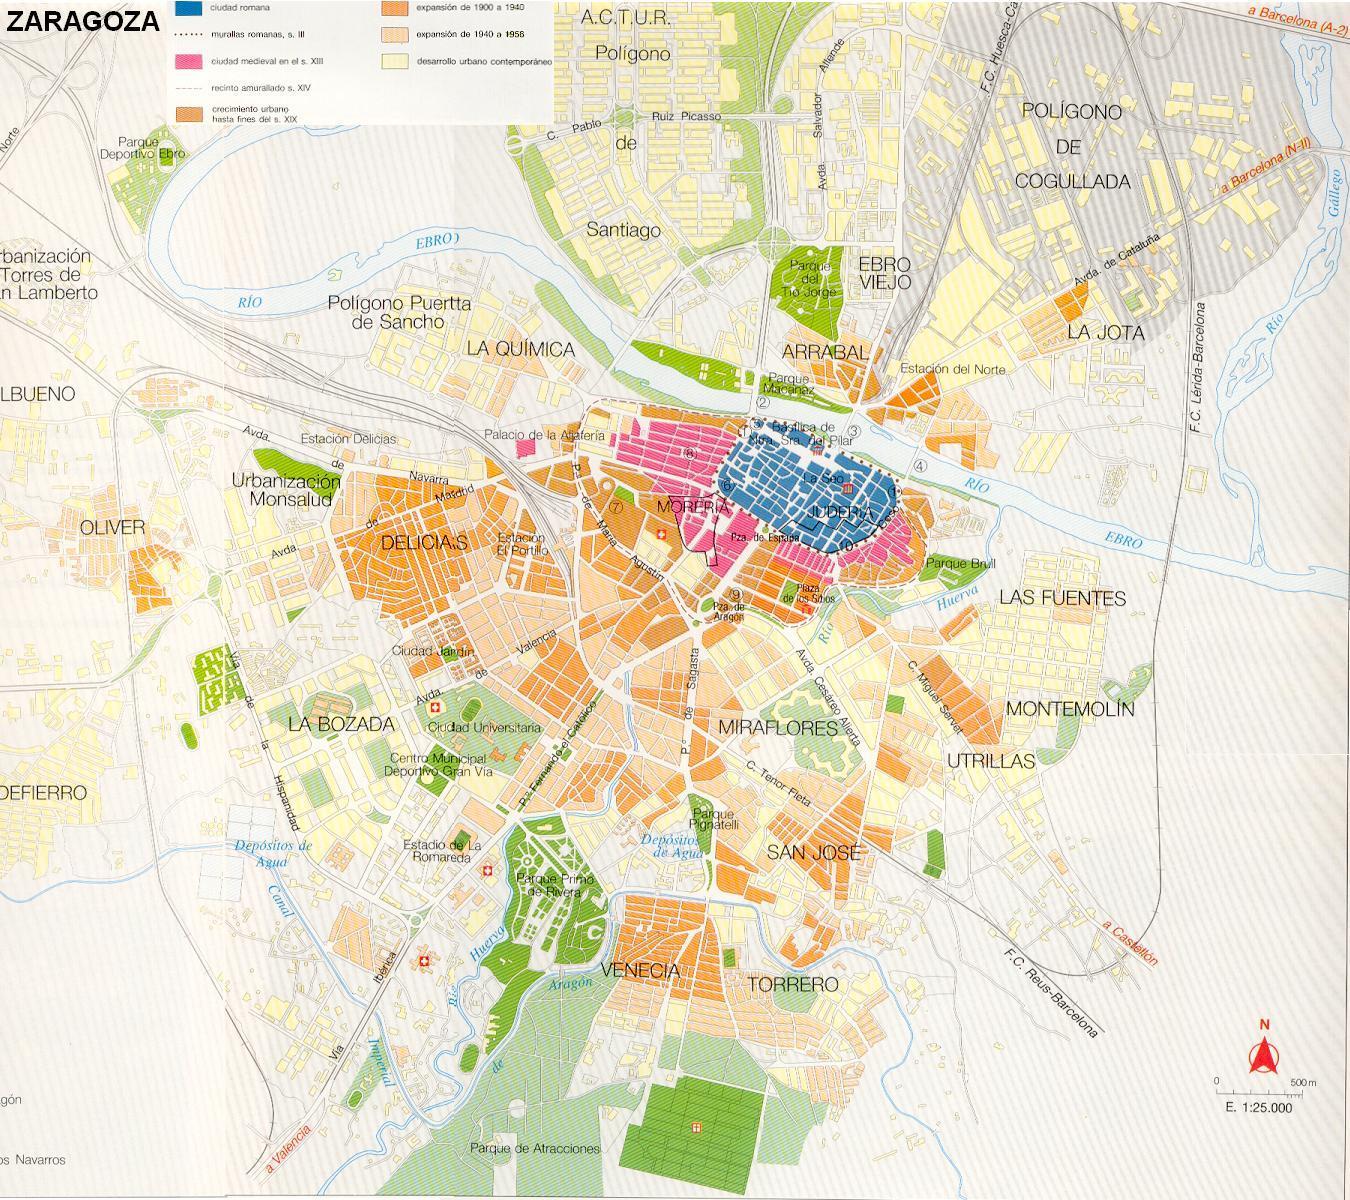 Mapa De Zaragoza Ciudad.Mapa De Zaragoza Mapa Owje Com